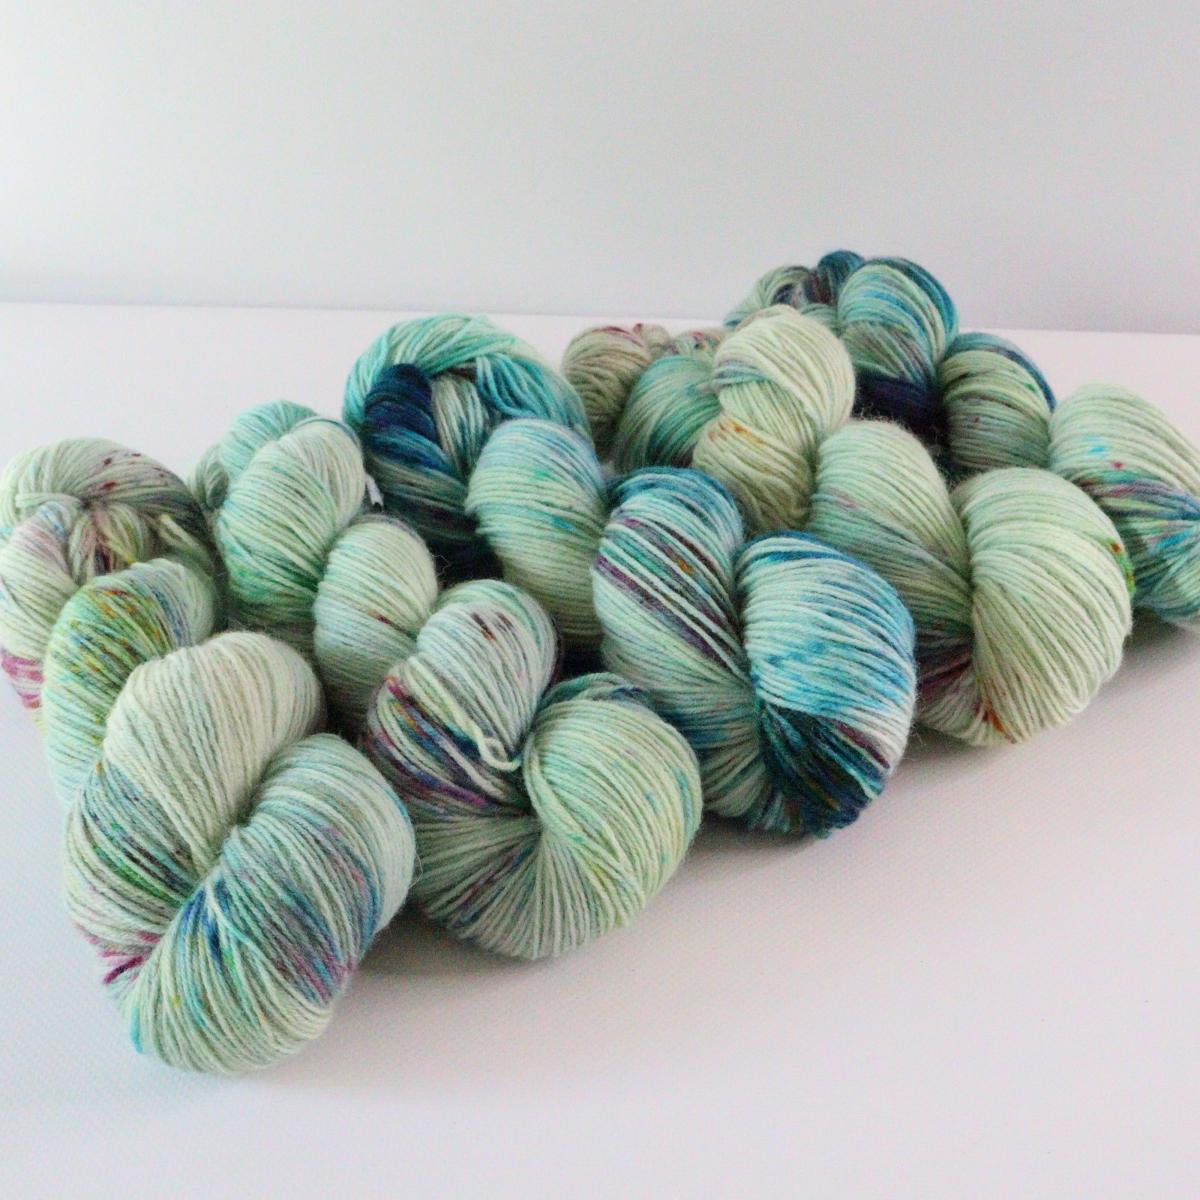 woodico.pro hand dyed yarn 072 1200x1200 - Hand dyed yarn / 072